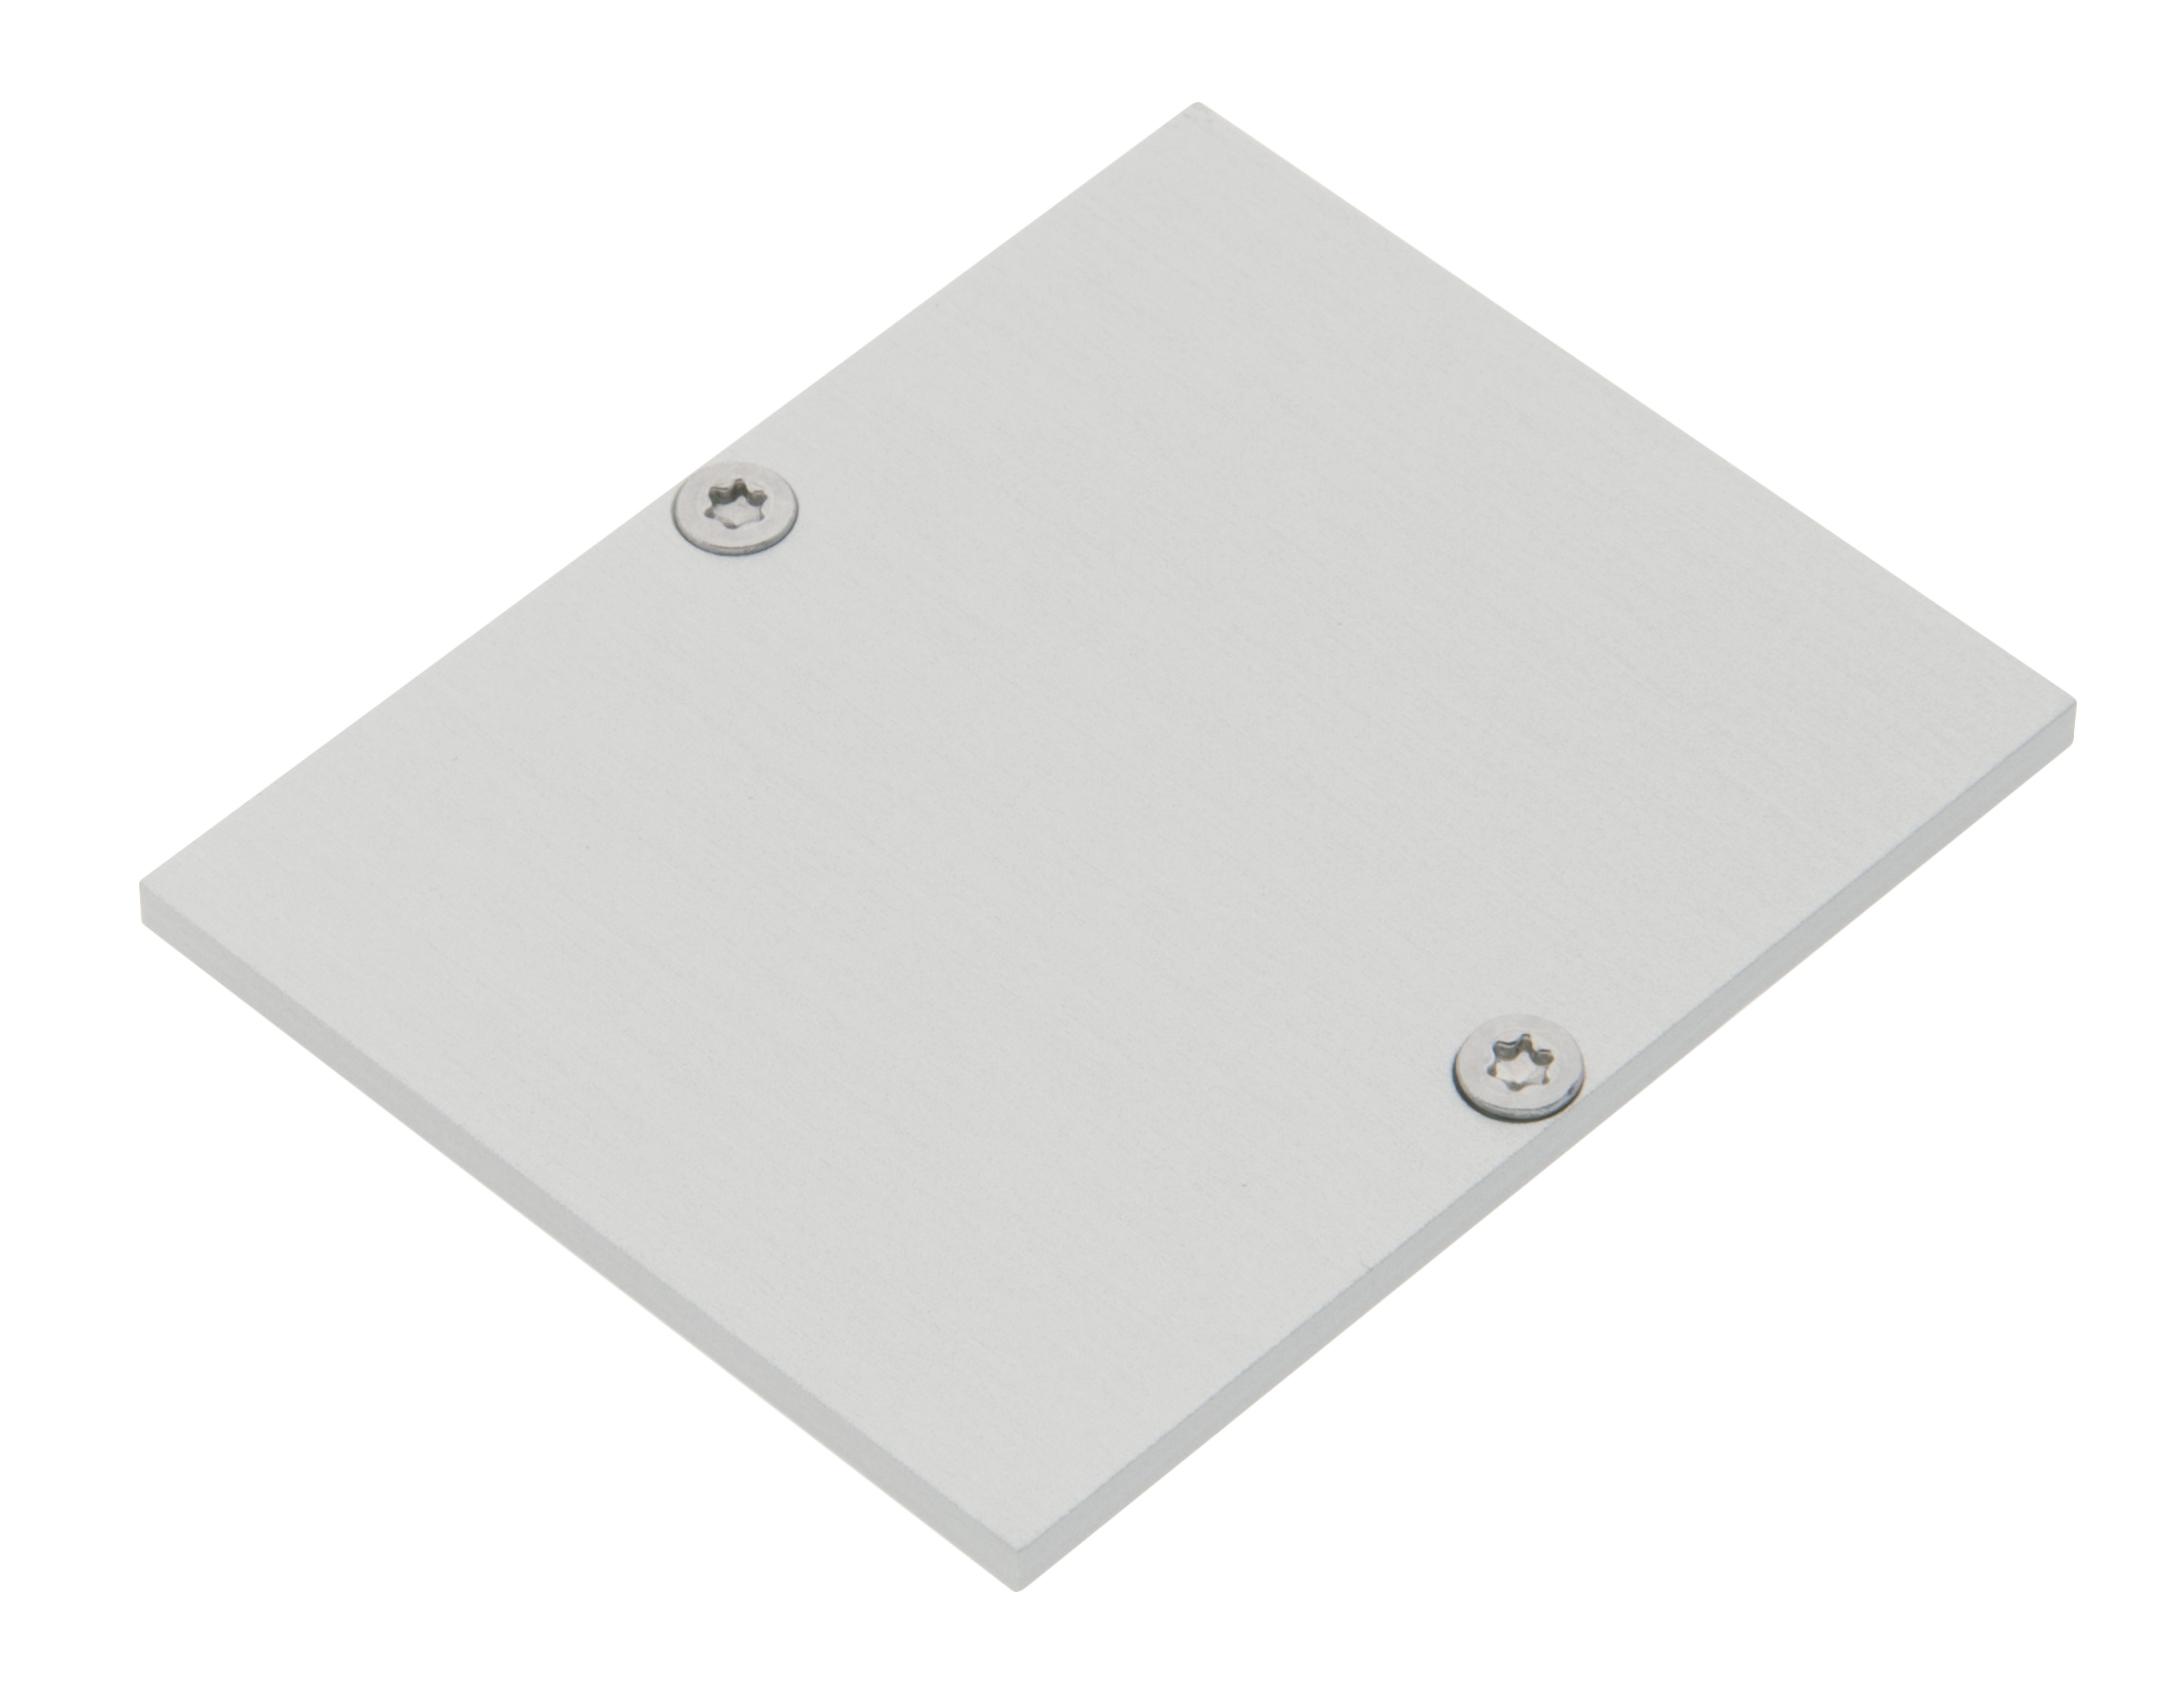 1 Stk Profil Endkappe MFS + MFL Eckig geschlossen inkl. Schrauben LIEK005625